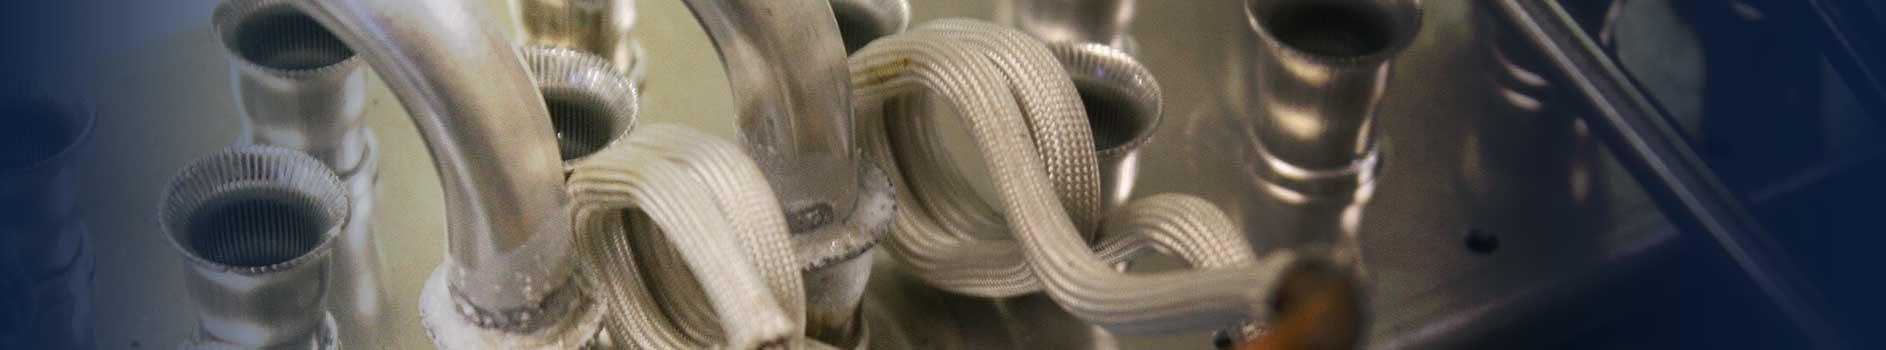 Brazing Aluminum with Induction image